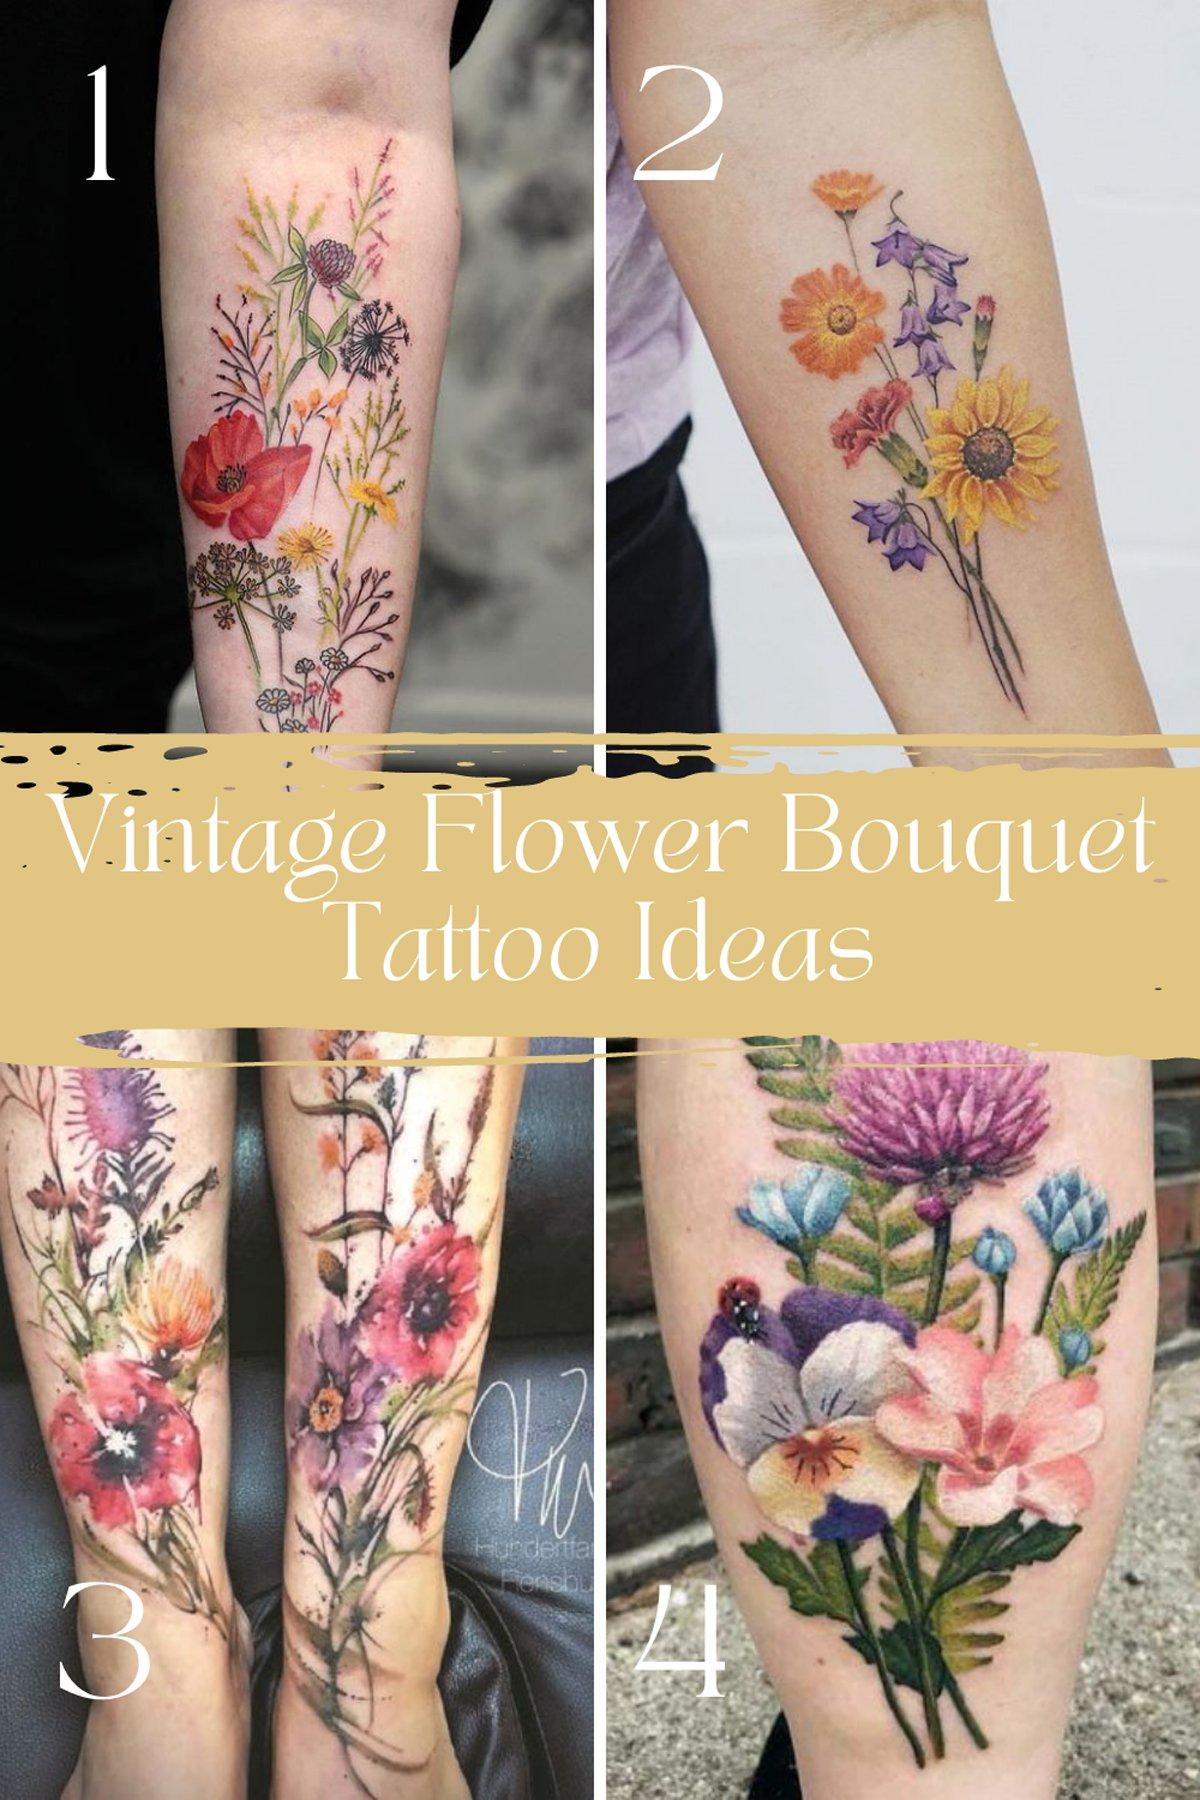 Colorful Vintage Flower Tattoo Designs